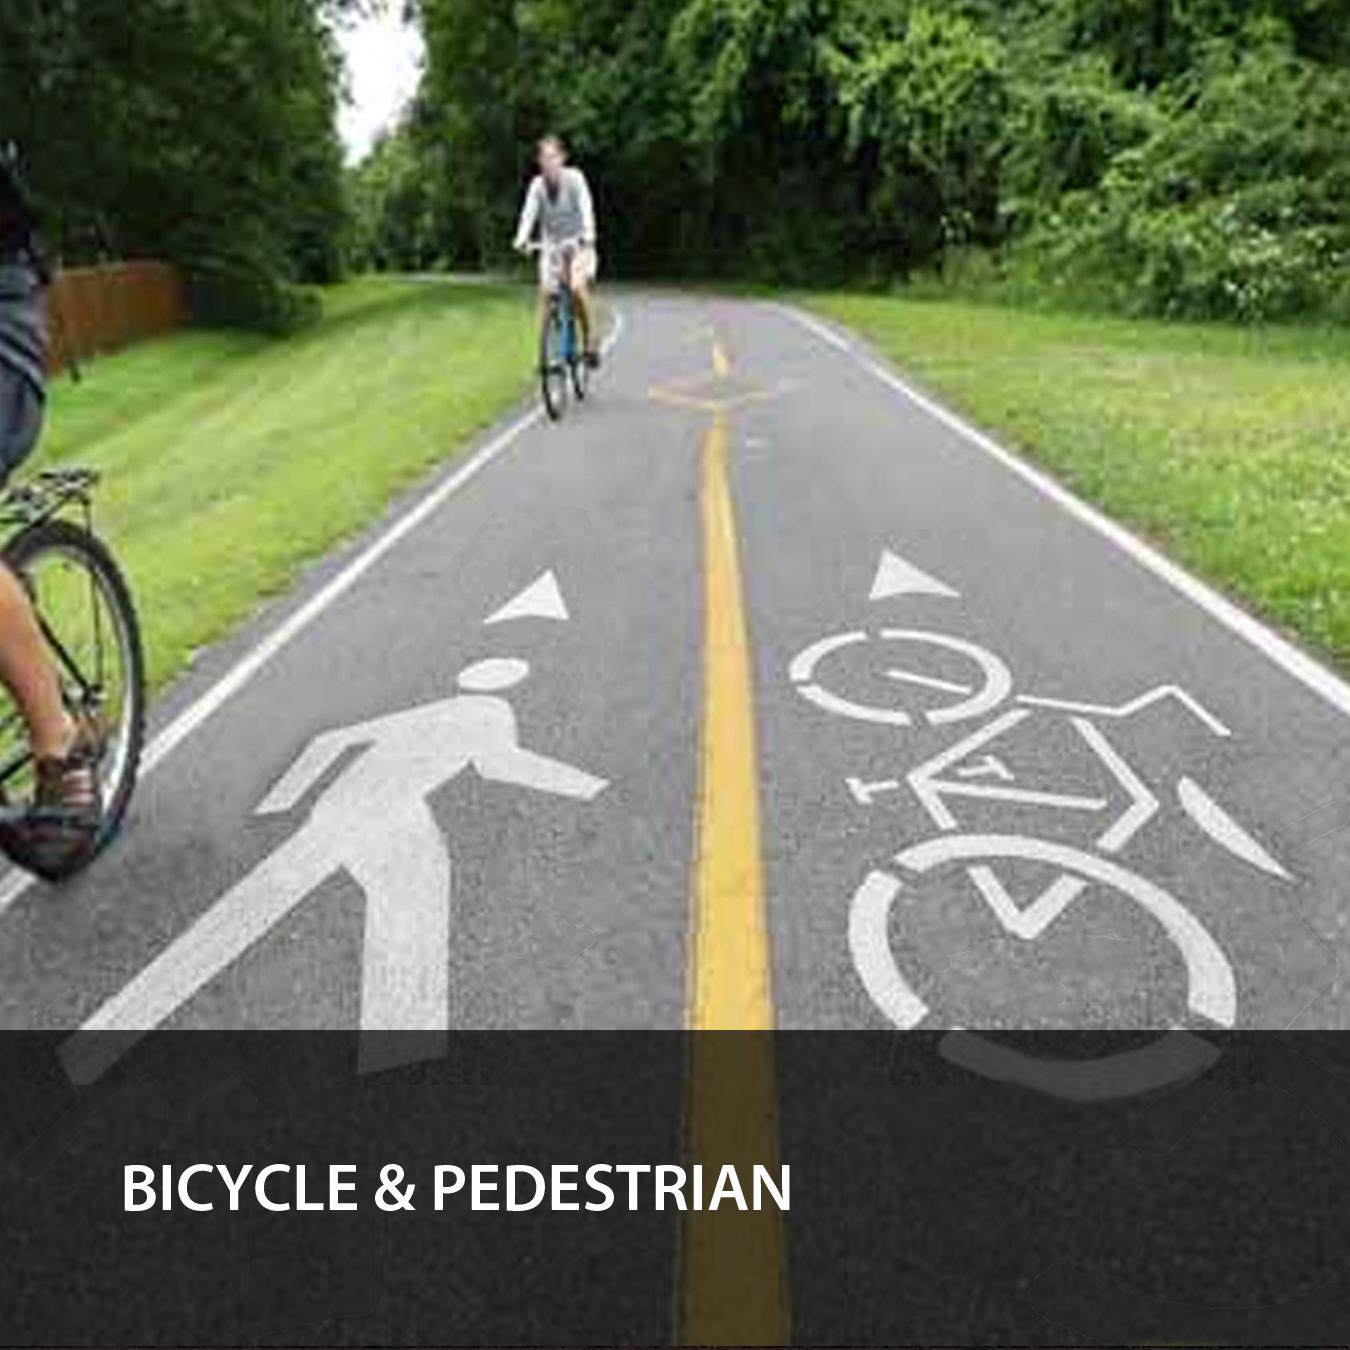 BICYCLE & PEDESTRIAN